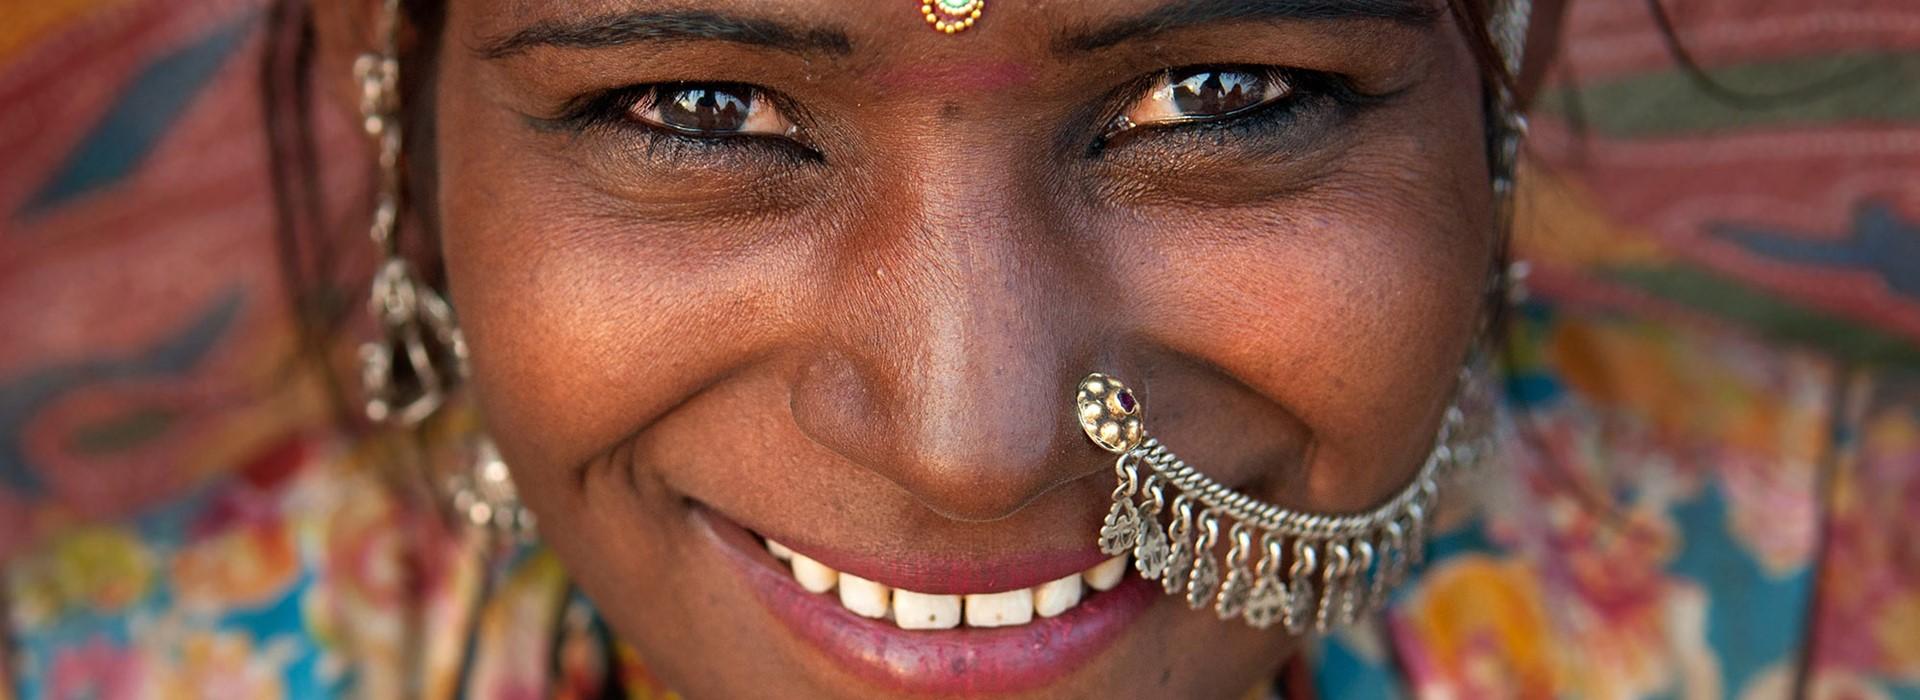 India - Marigold Hotel Experience